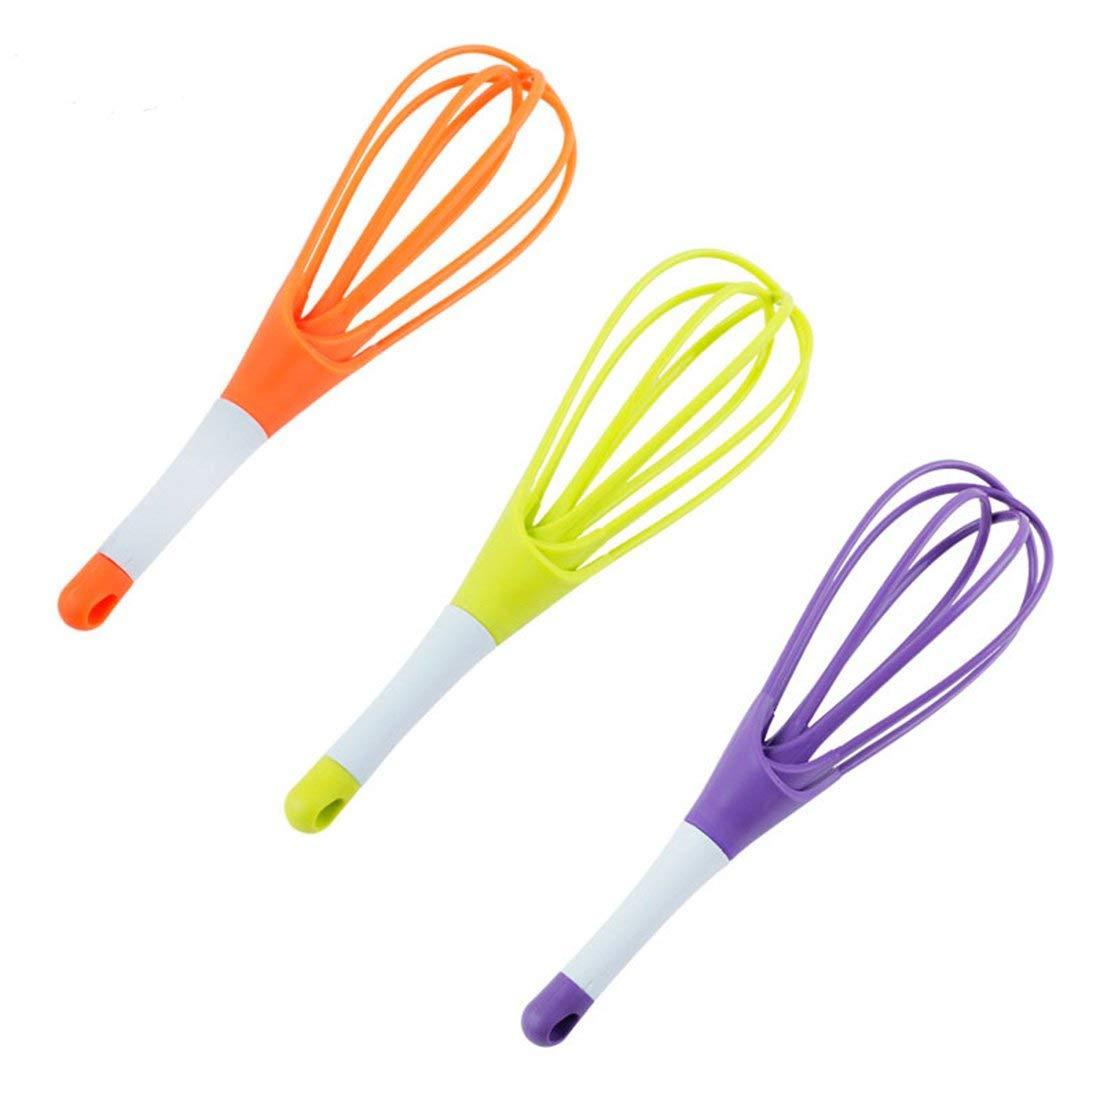 3Pcs 3 Colors/set Kitchen Gadgets Egg Beaters Egg Whisk Mixer Kitchen Blender Baking Flour Stirrer